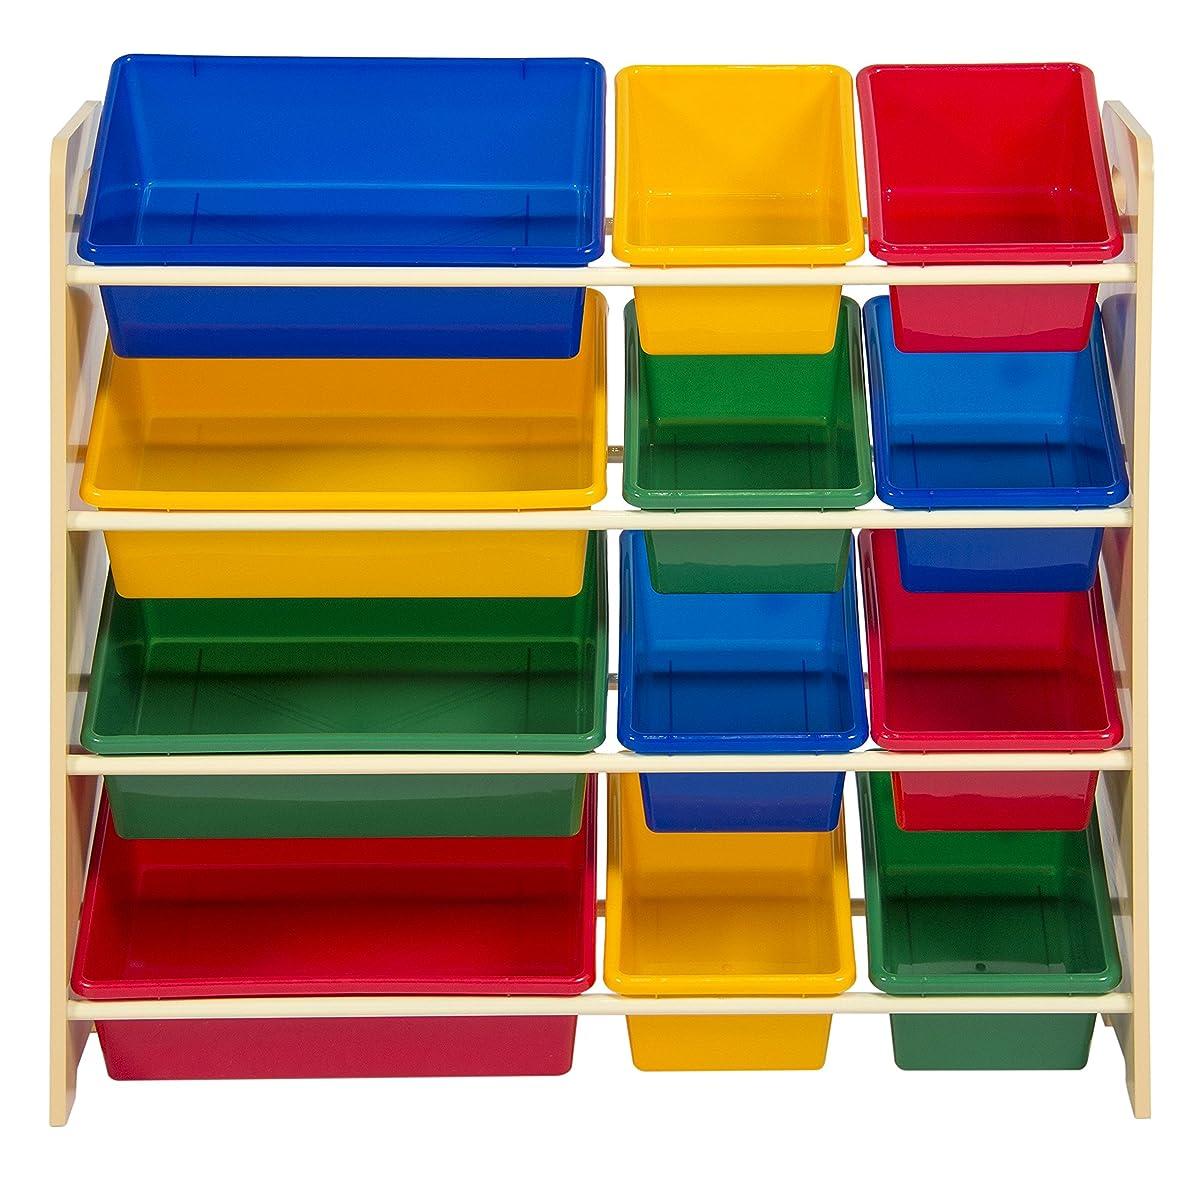 Best Choice Products Toy Bin Organizer Kids Childrens Storage Box Playroom Bedroom Shelf Drawer